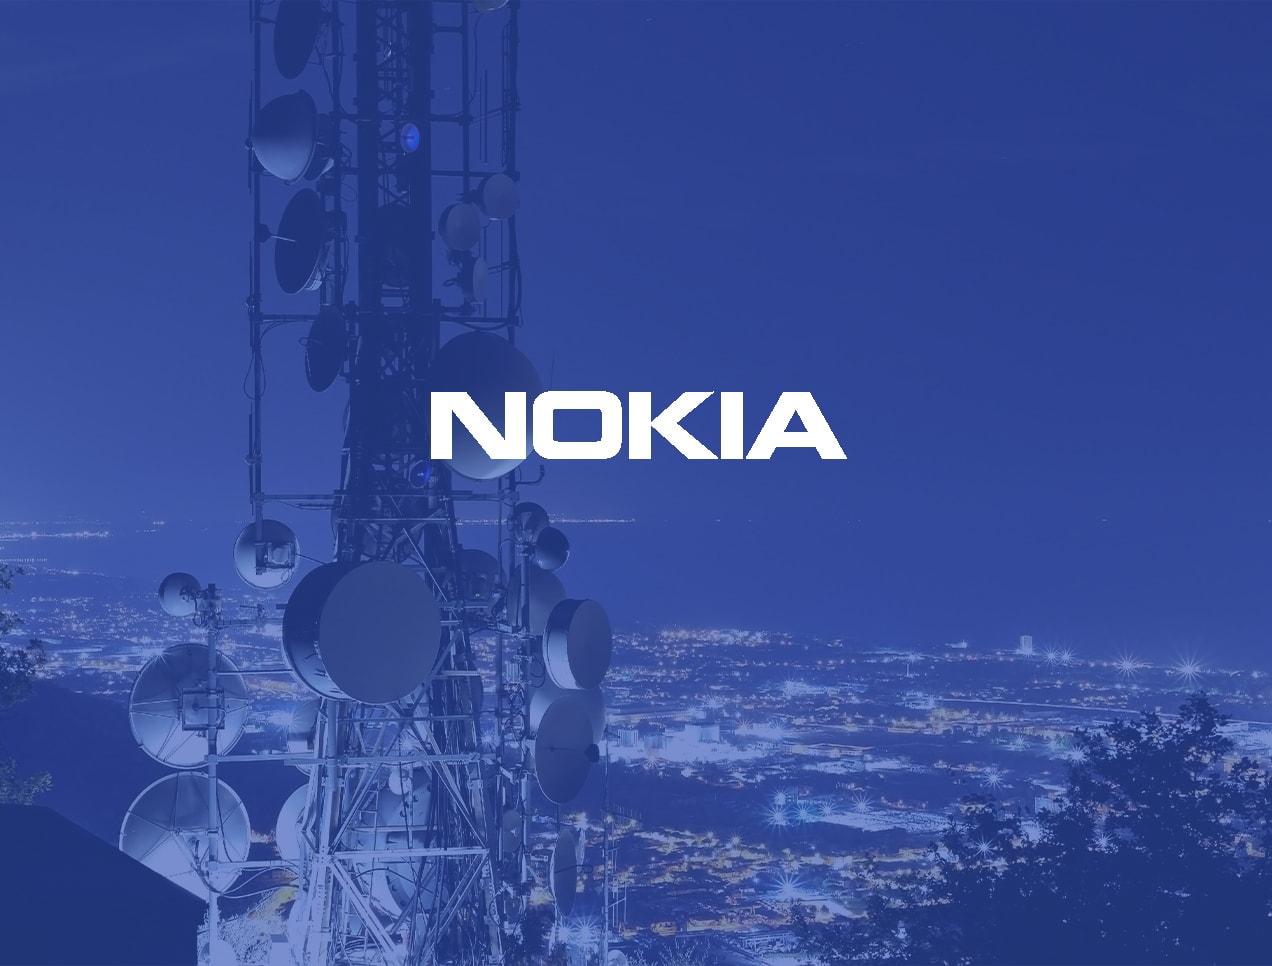 Nokia - Hoshin facilitation